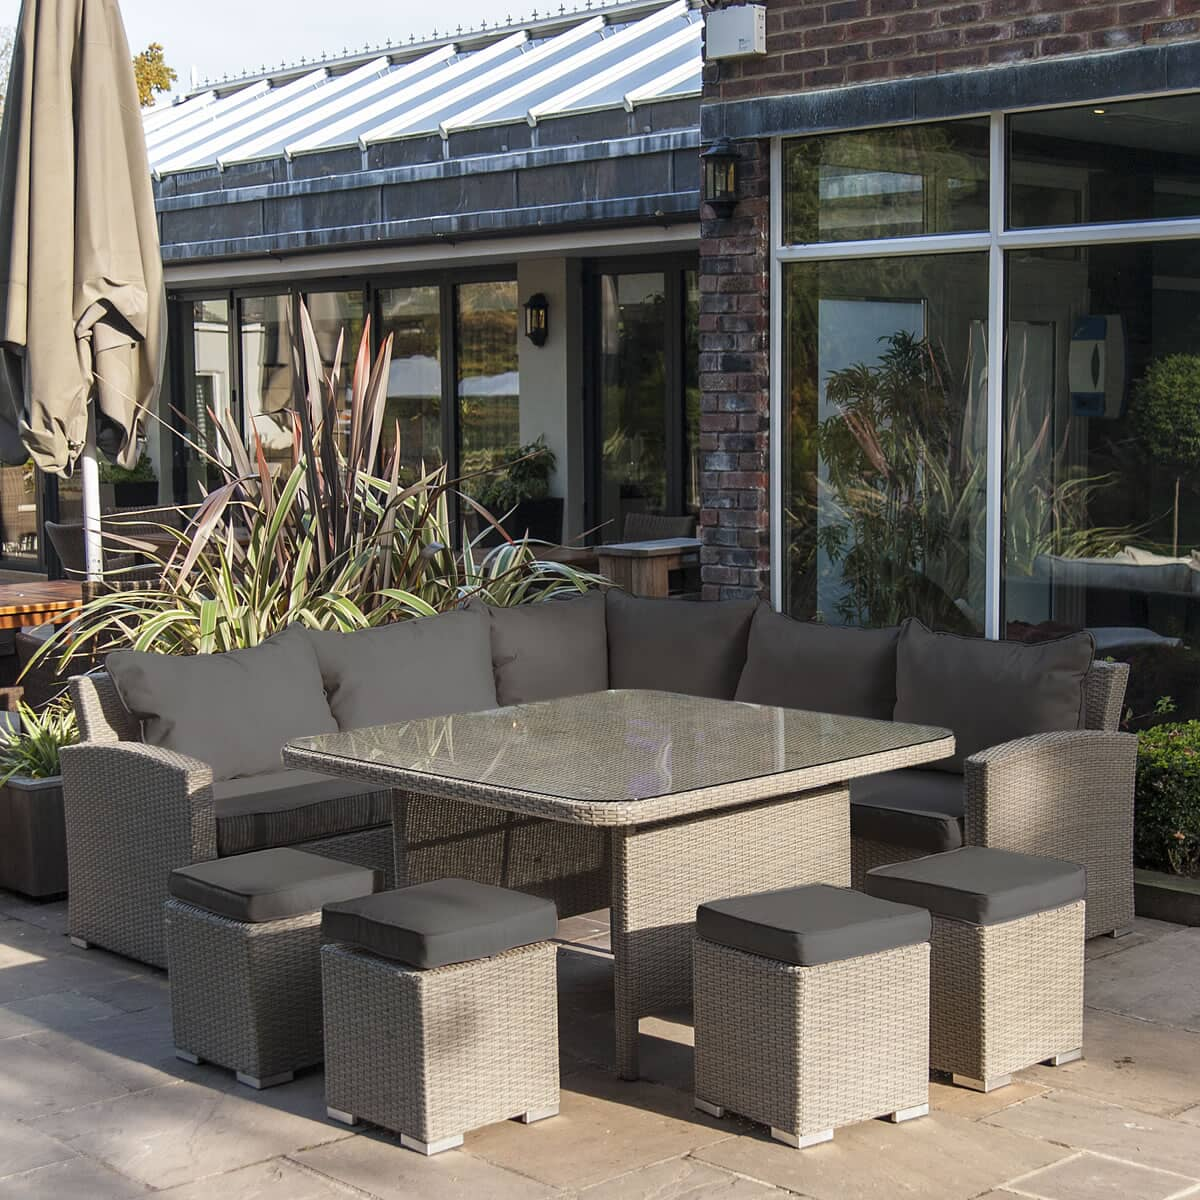 Alexander Rose Bespoke Casual Dining Set 7721sla Garden Furniture World